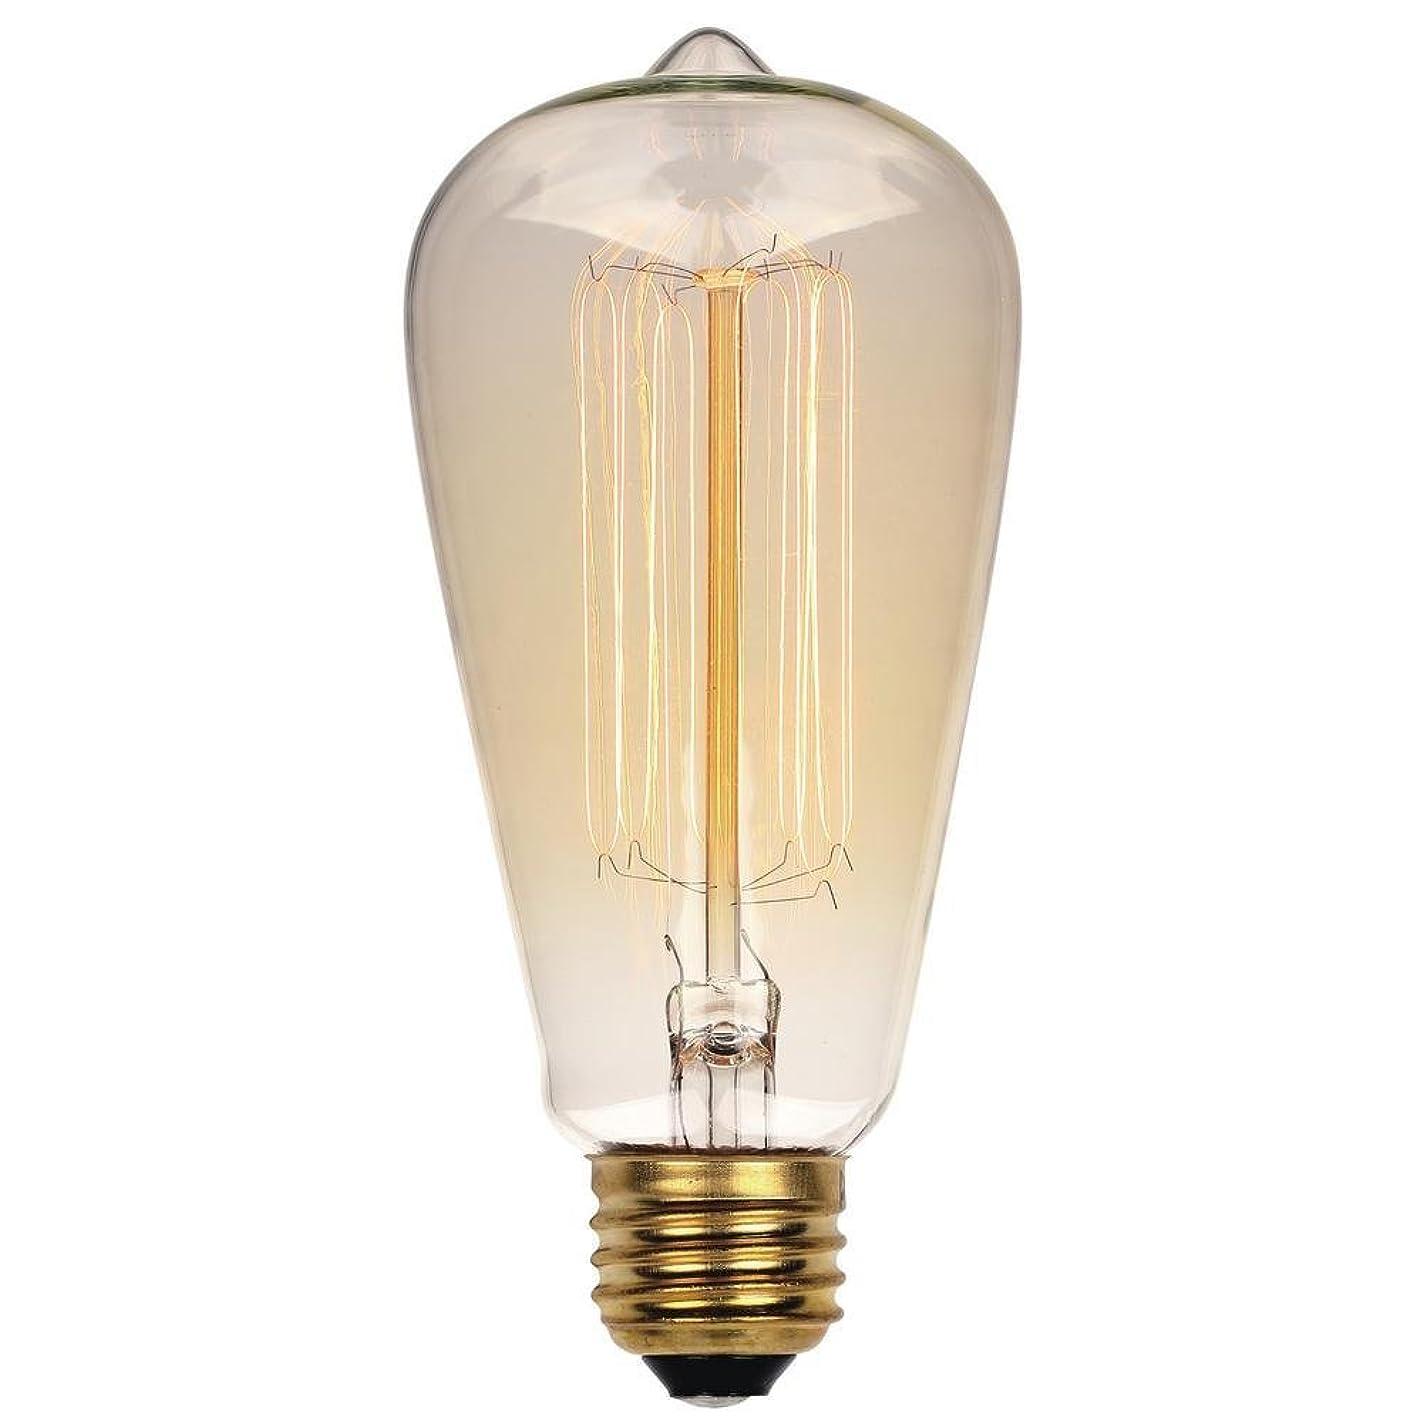 Westinghouse Lighting 0413200 60 Watt ST20 Clear Timeless Vintage Inspired Bulb with Medium Base